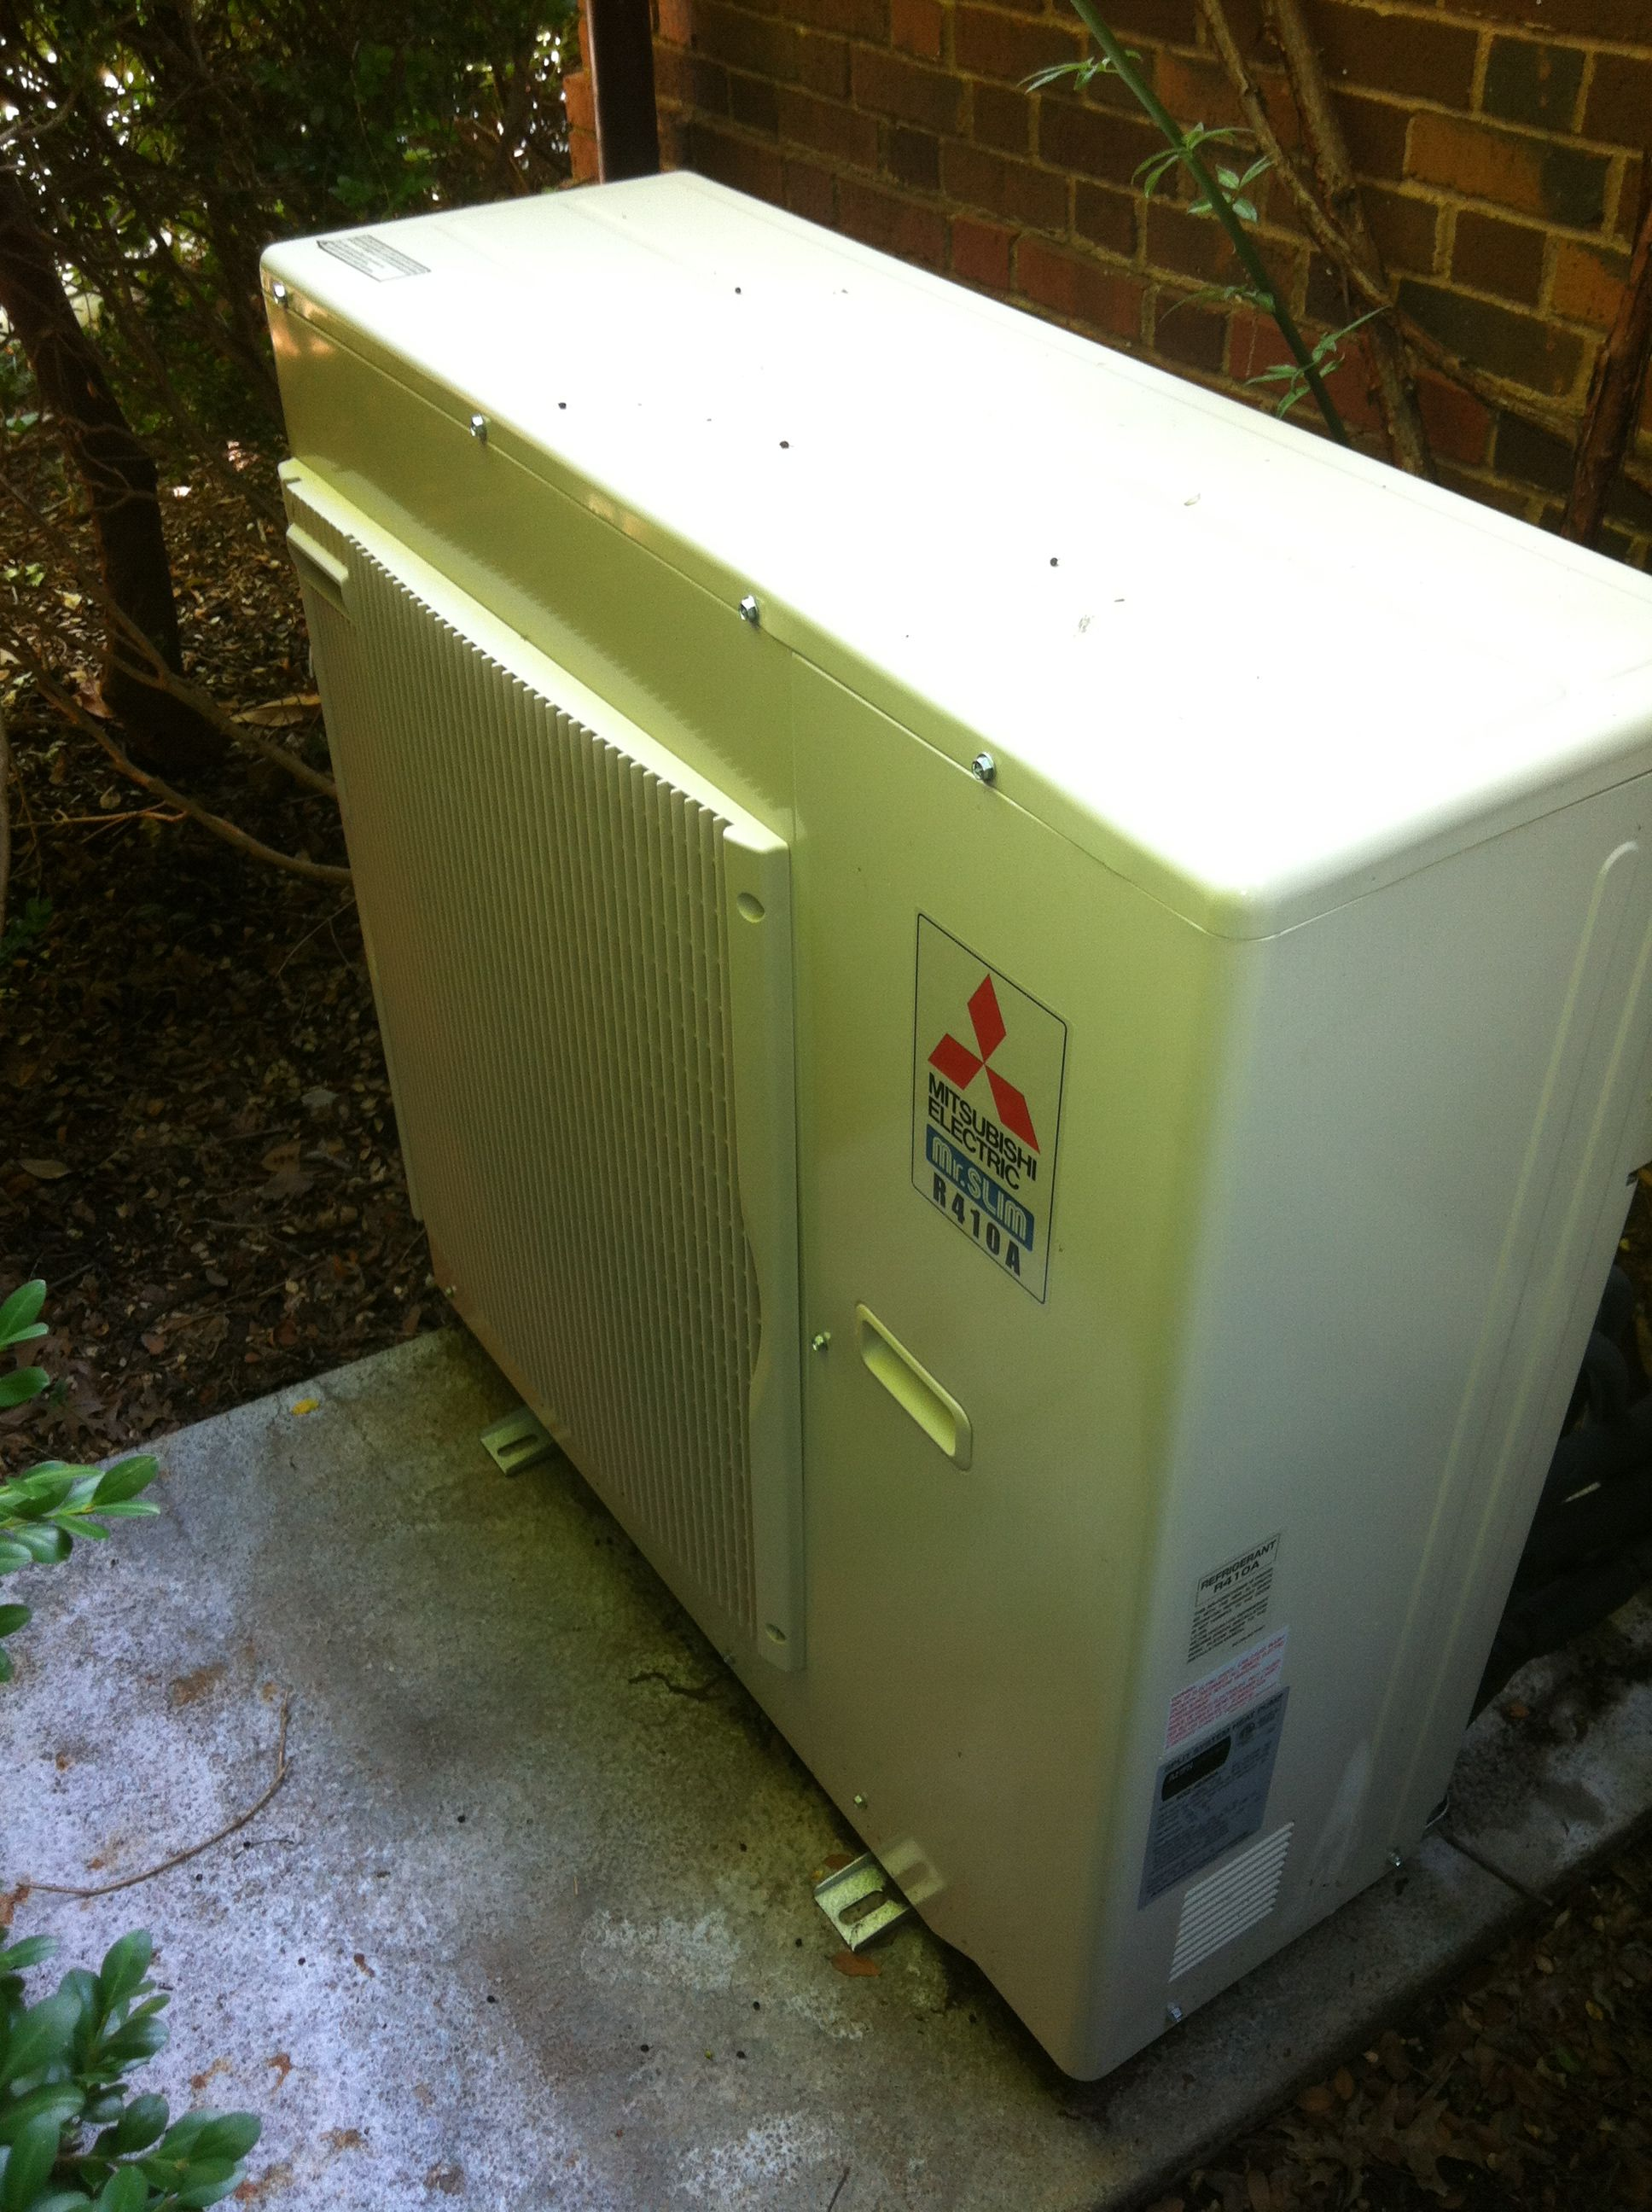 Mitsubishi 3 Ton 3 Zone Heat Pump Outdoor Unit Heating Services Outdoor Storage Box Heat Pump